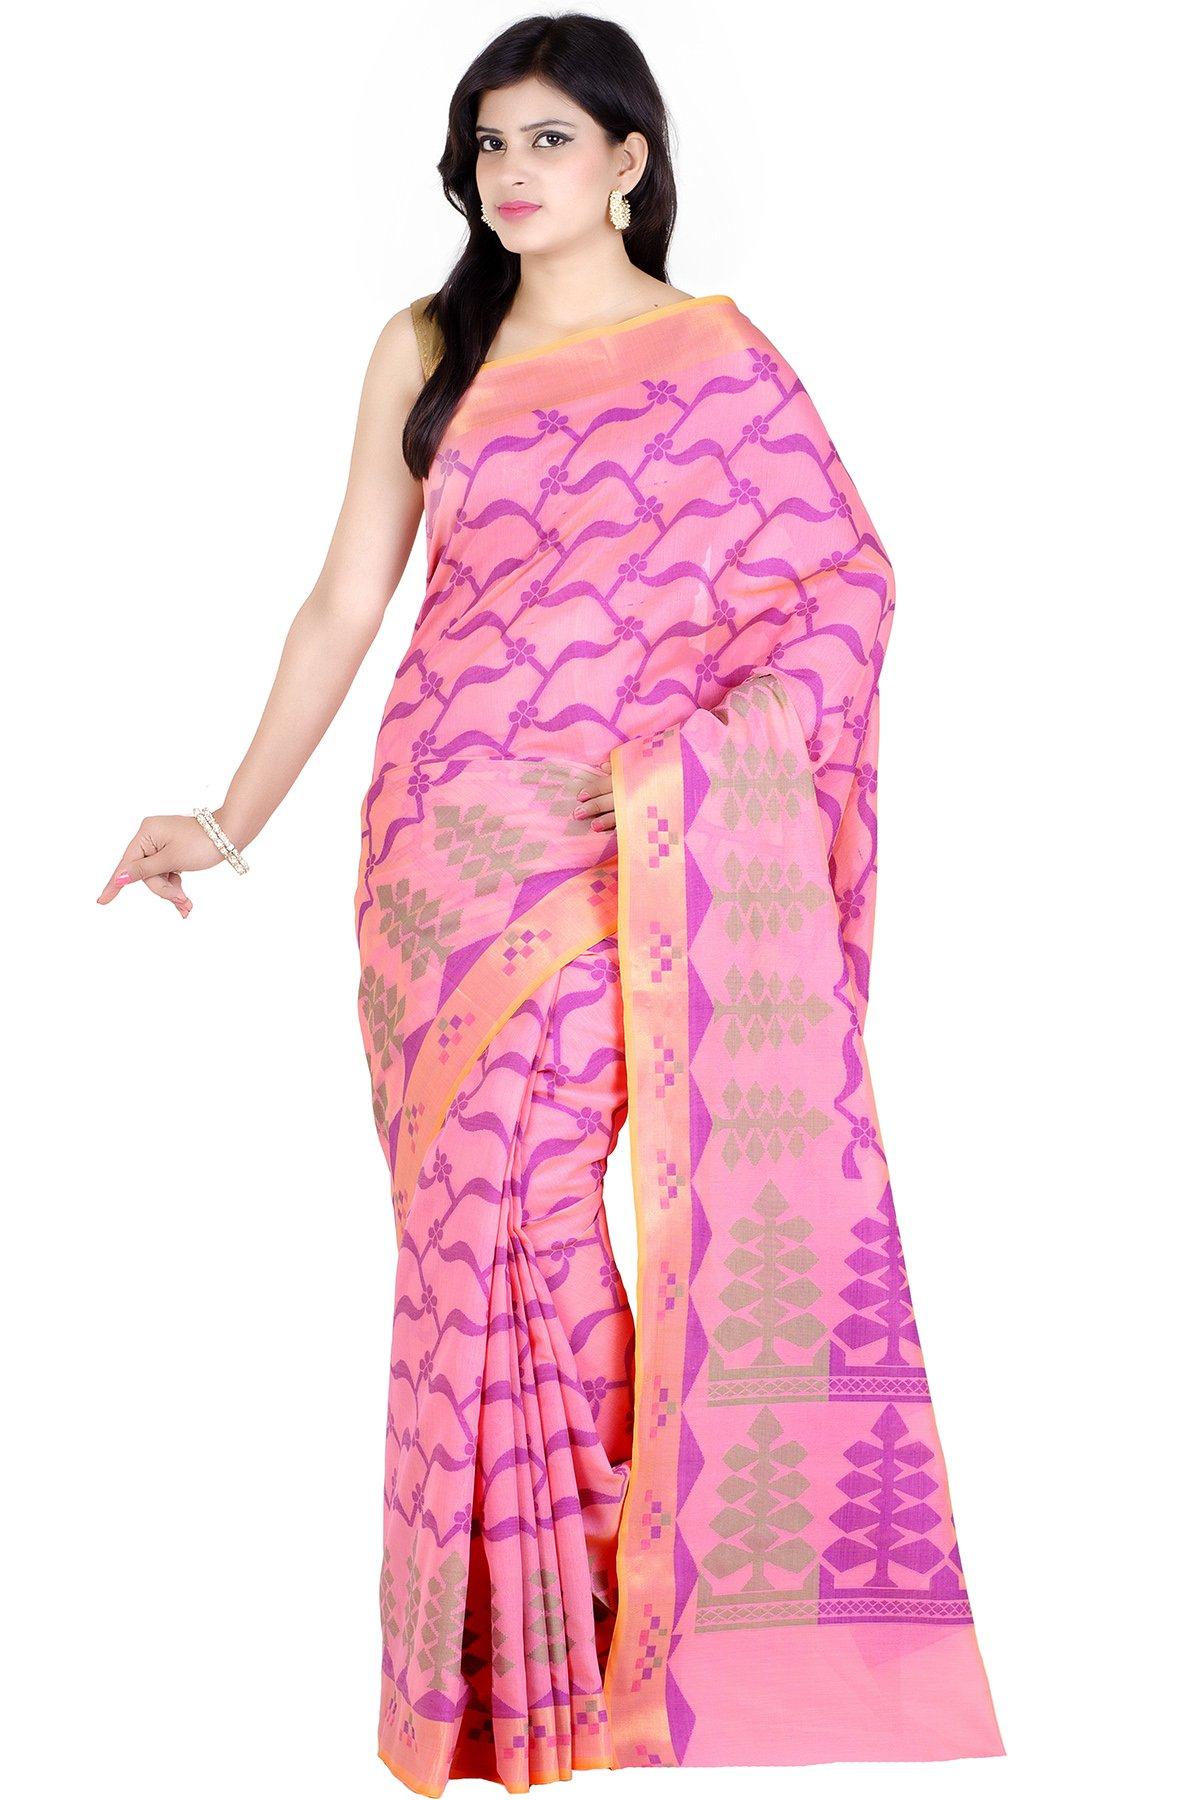 Chandrakala Women's Traditional Pink Cotton,Banarasi Style Saree